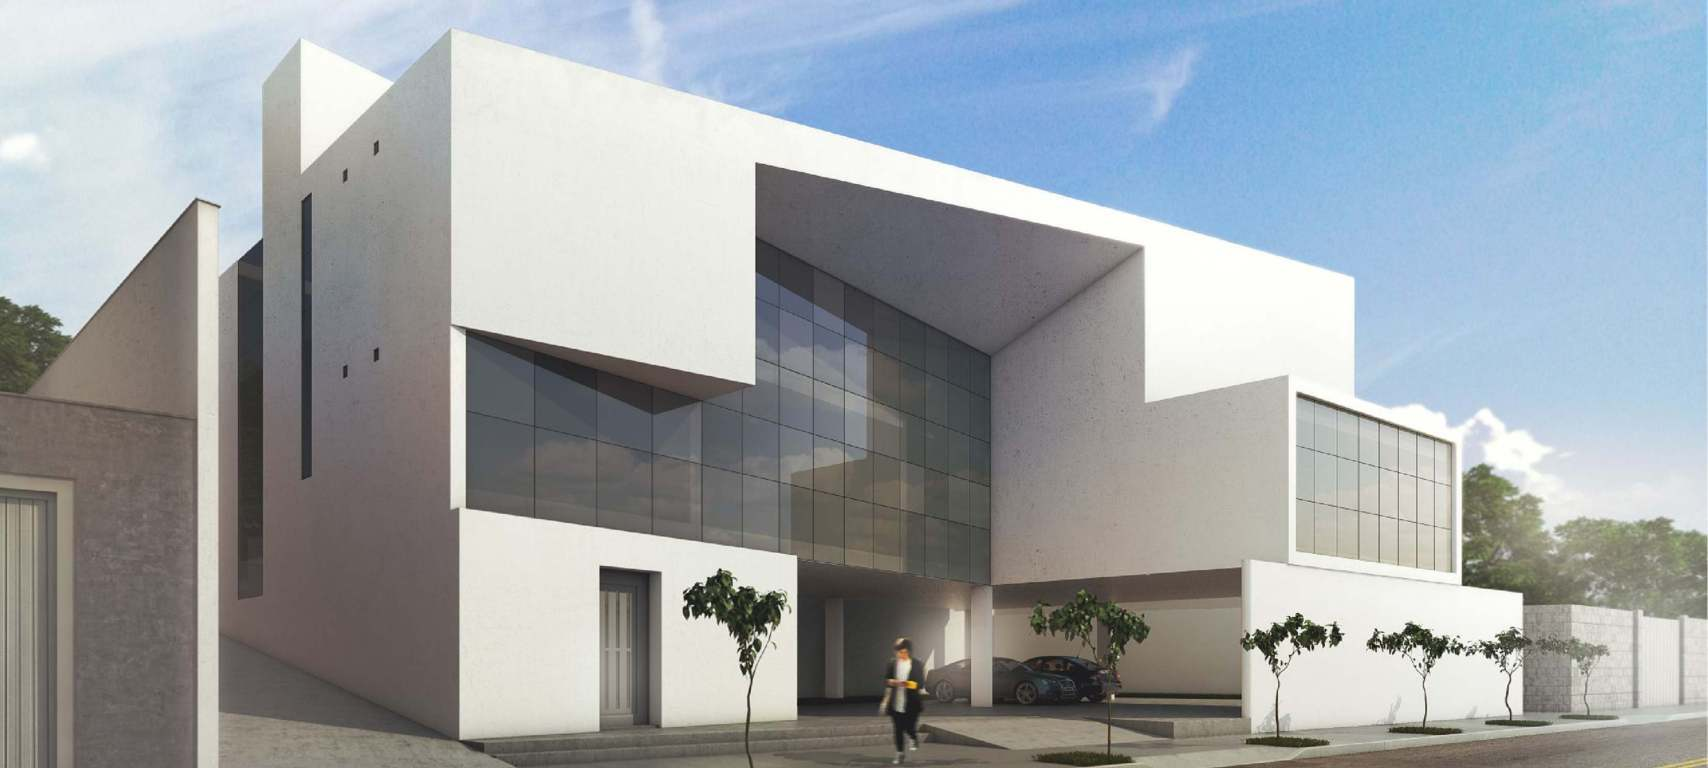 arquitetura corporativa-projeto de escritorios 1